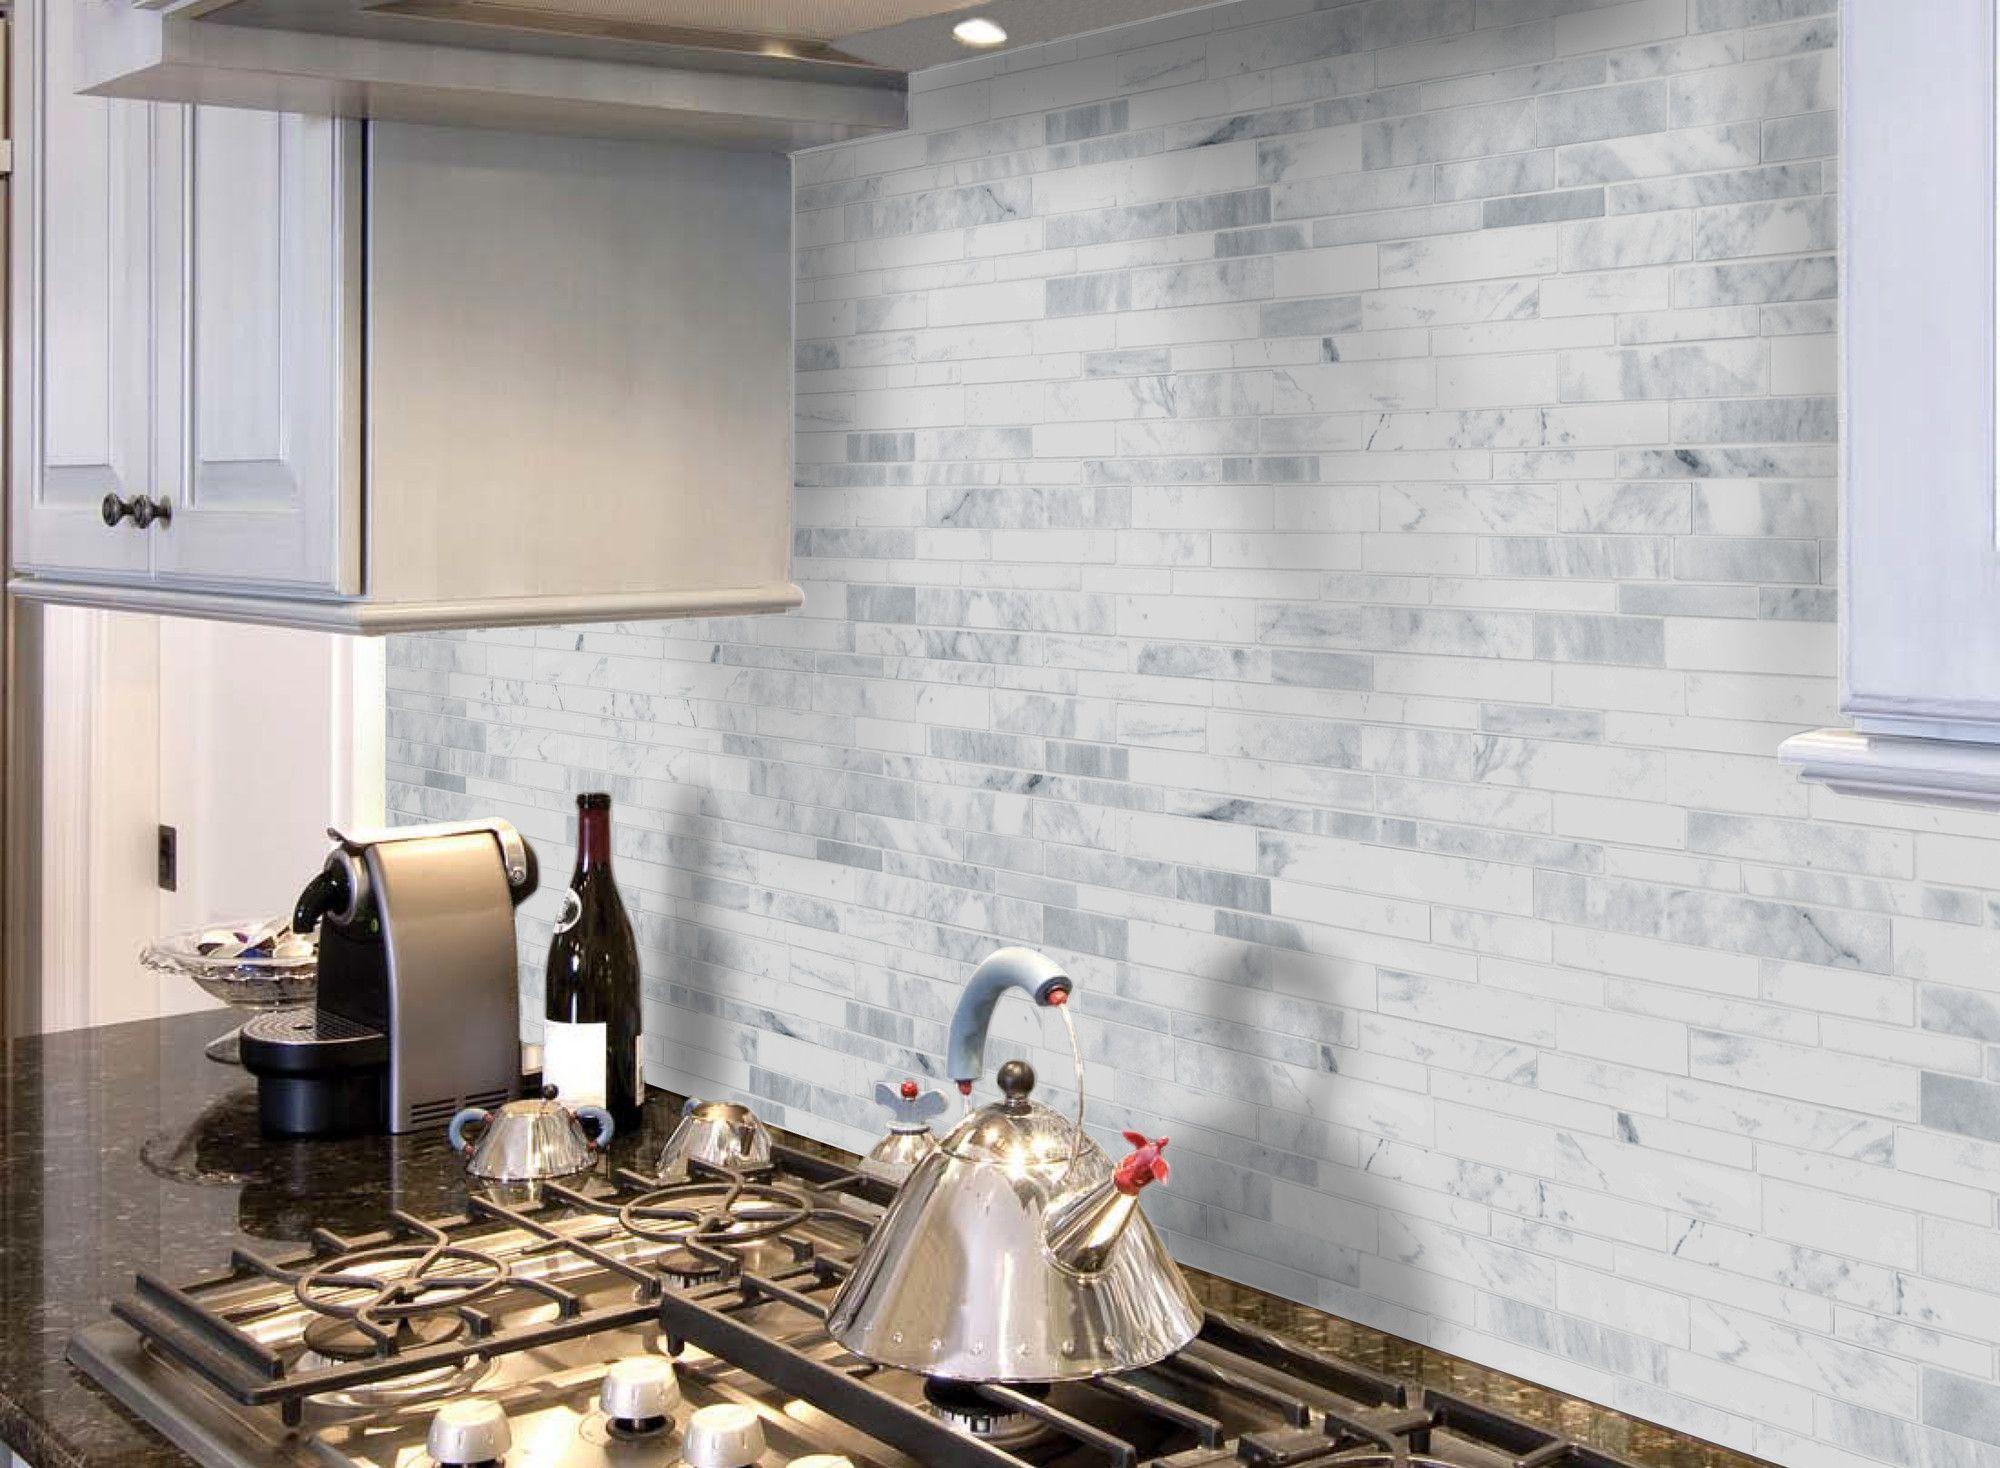 - Wayfair Kitchen Backsplash Tiles Collection-Faber Carrara Extra